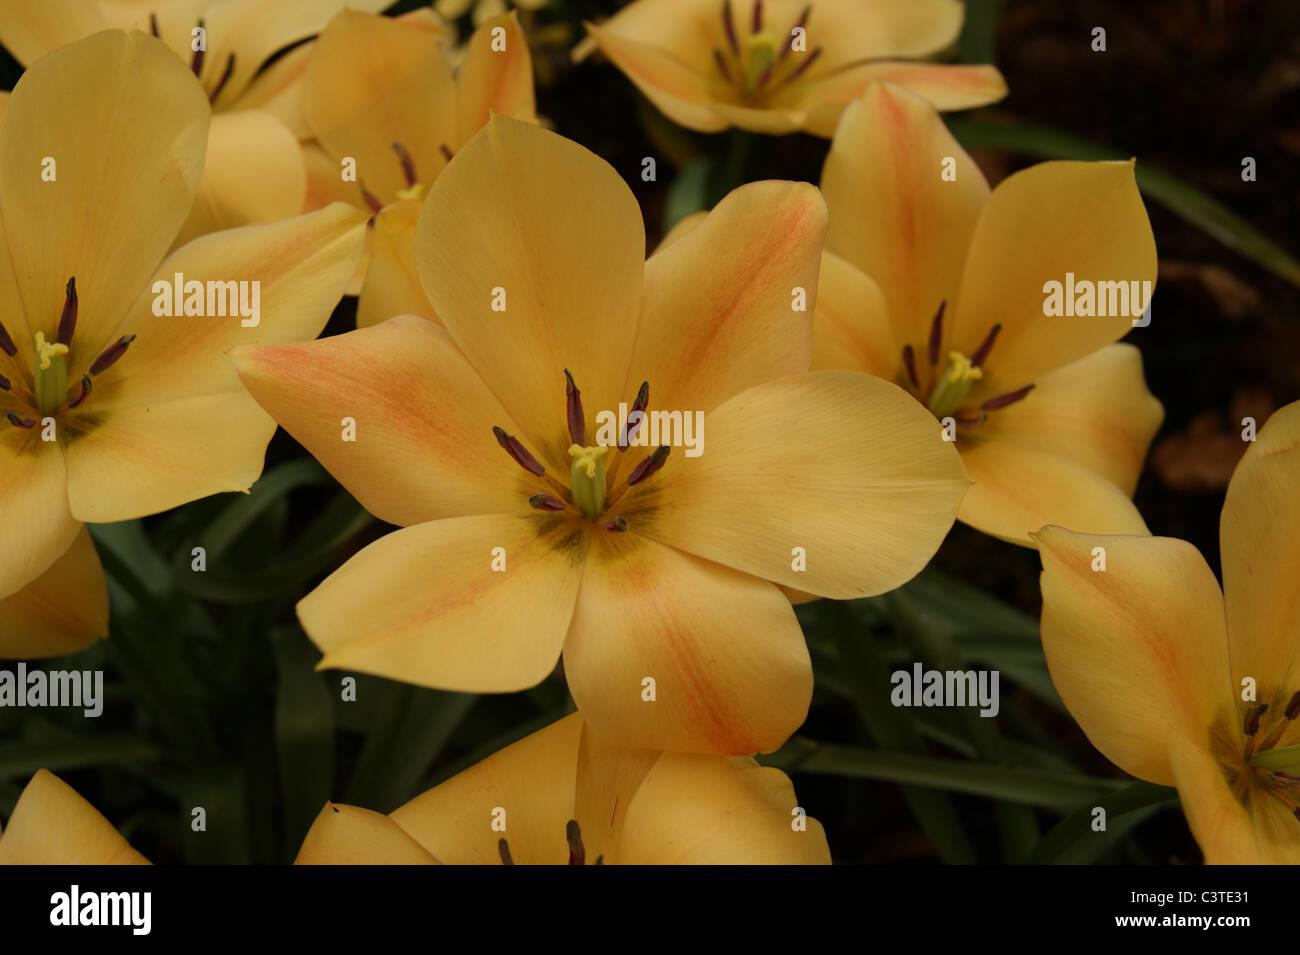 Tulips - Apricot Jewel - Stock Image